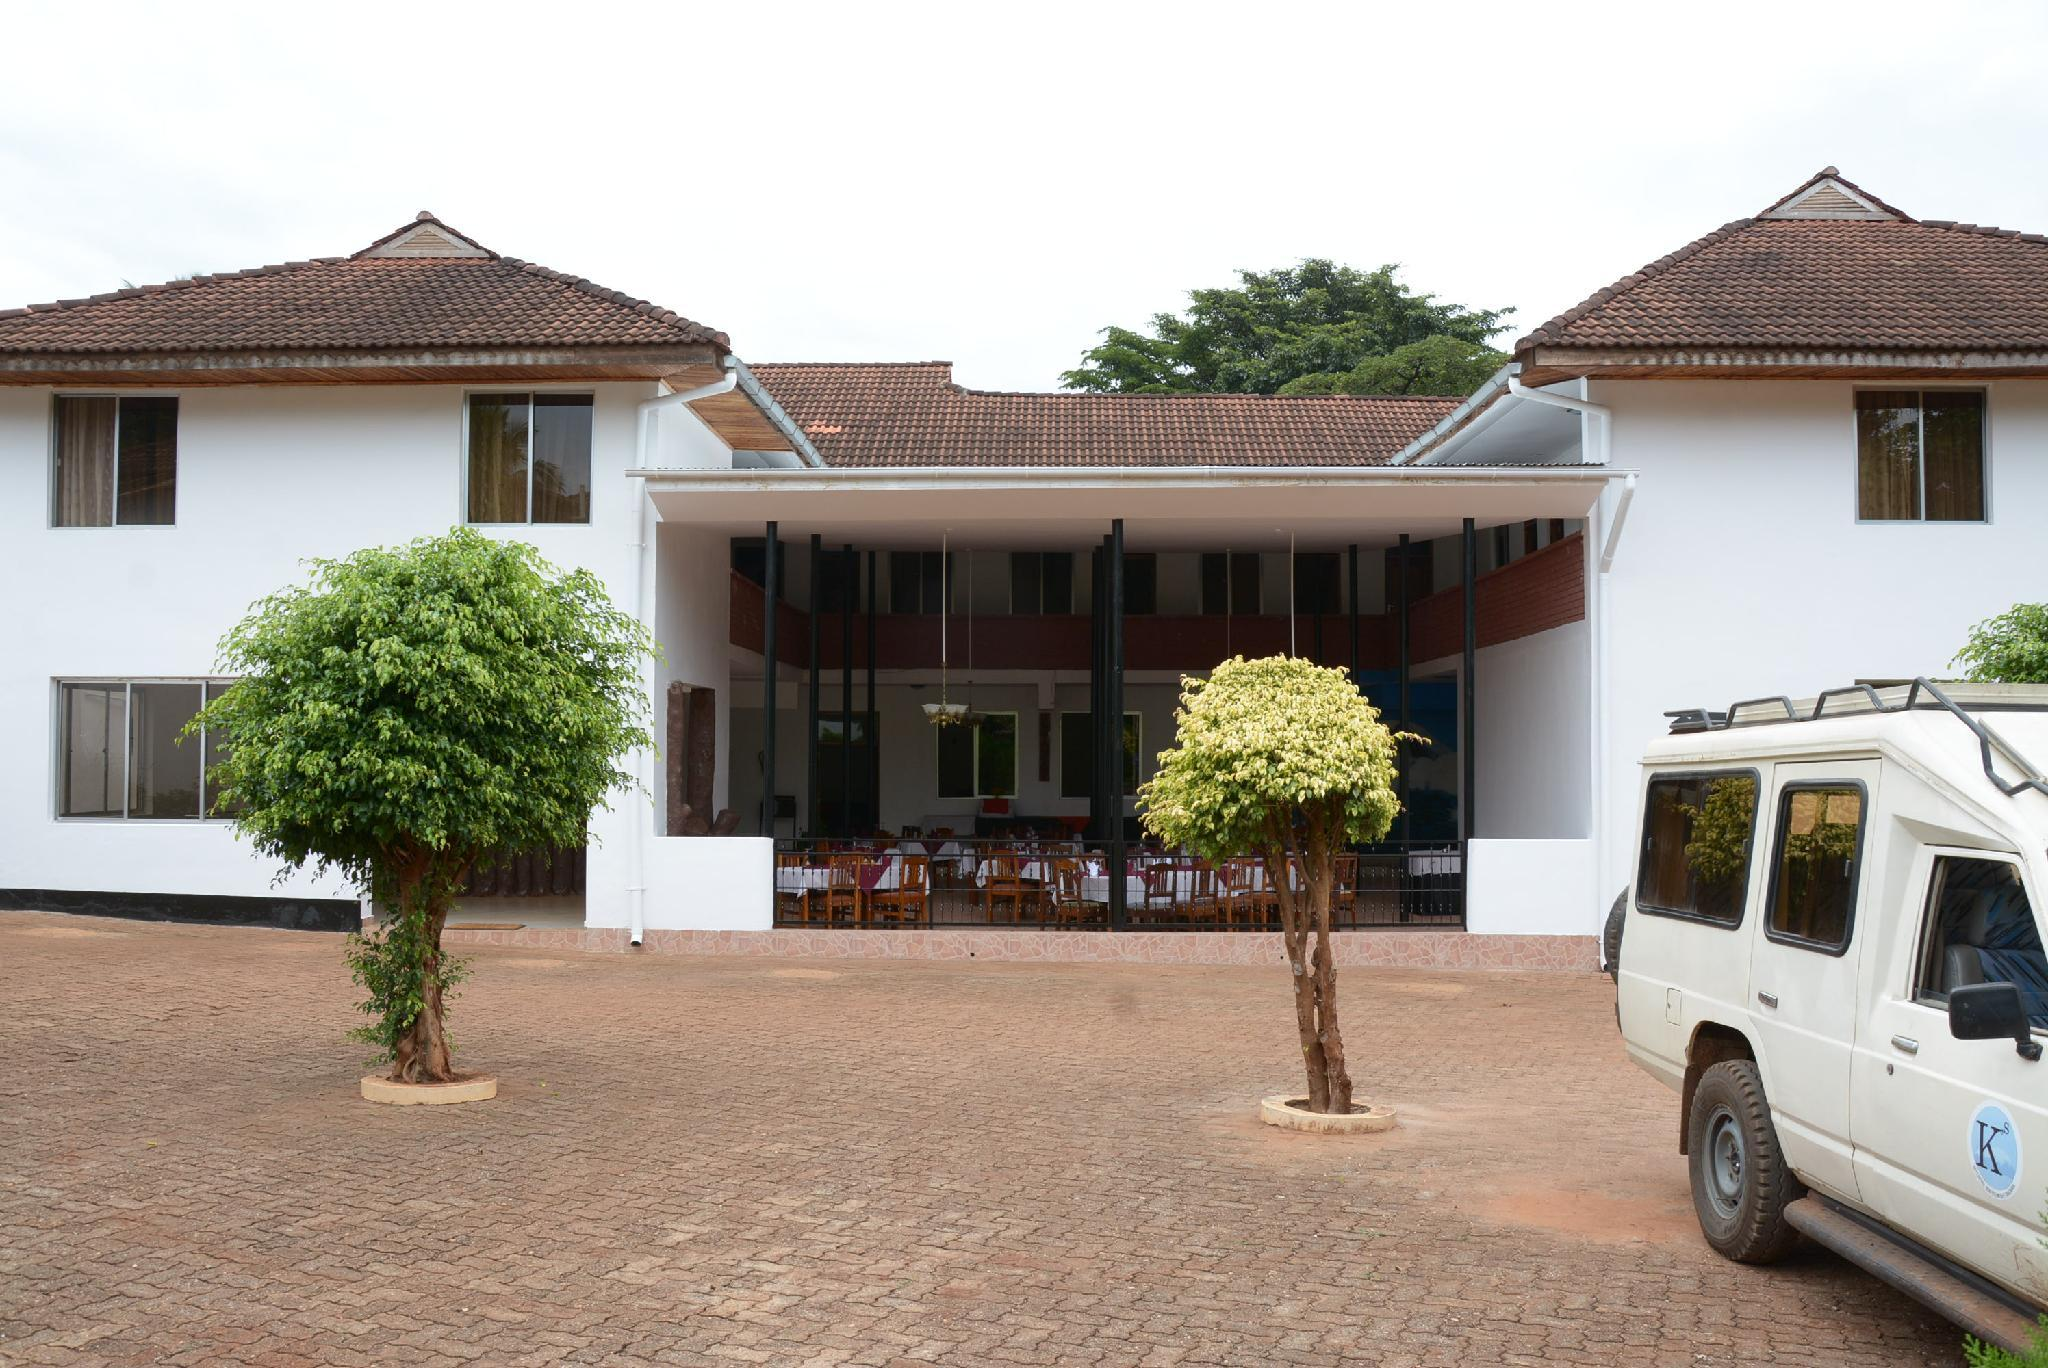 K'S Lodge, Moshi Urban